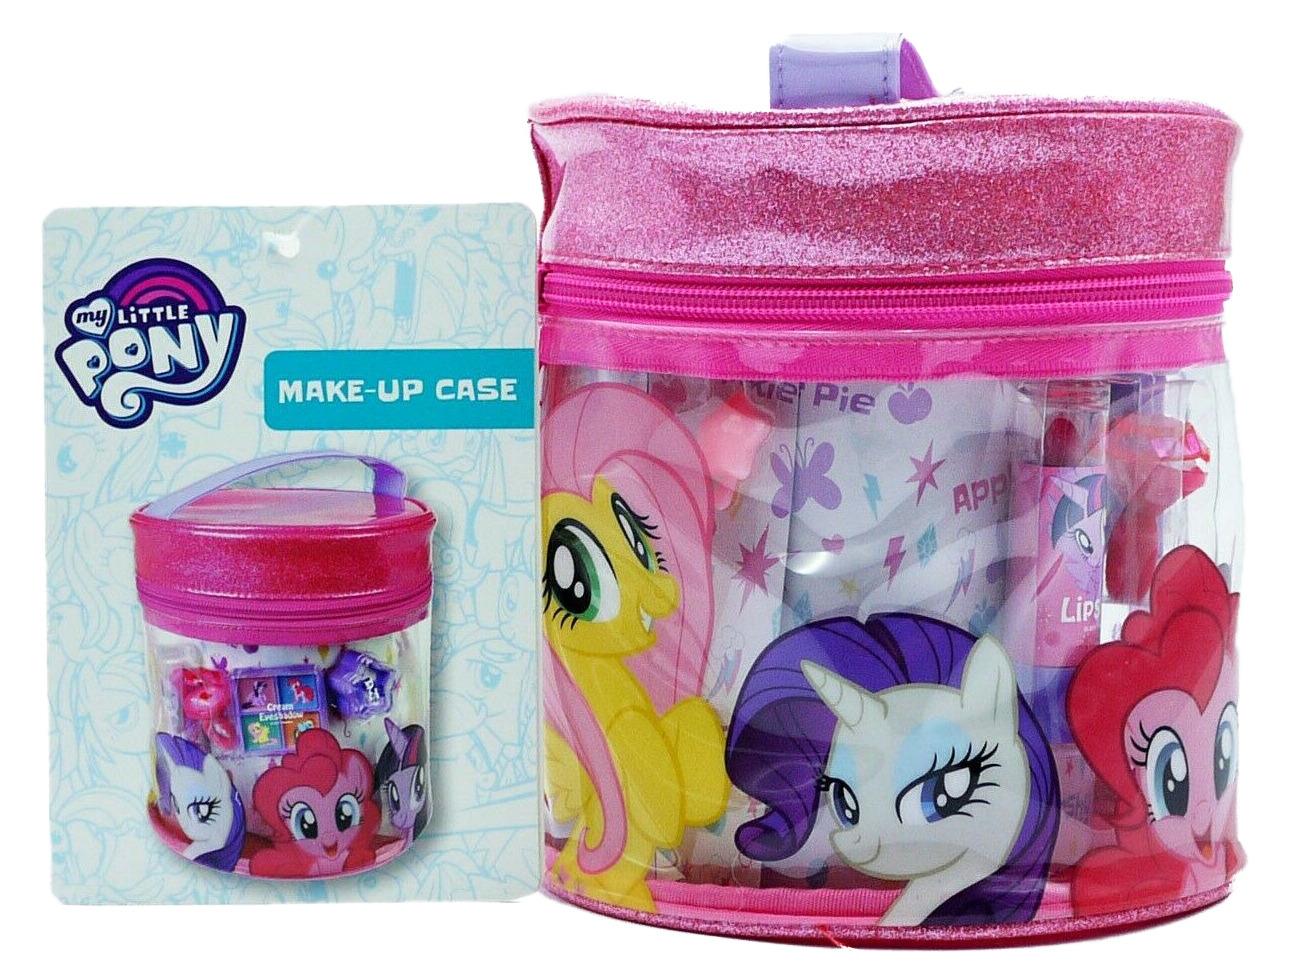 My Little Pony Pink Sparkly Make-Up Case Girls Gift Set Inc Make-Up